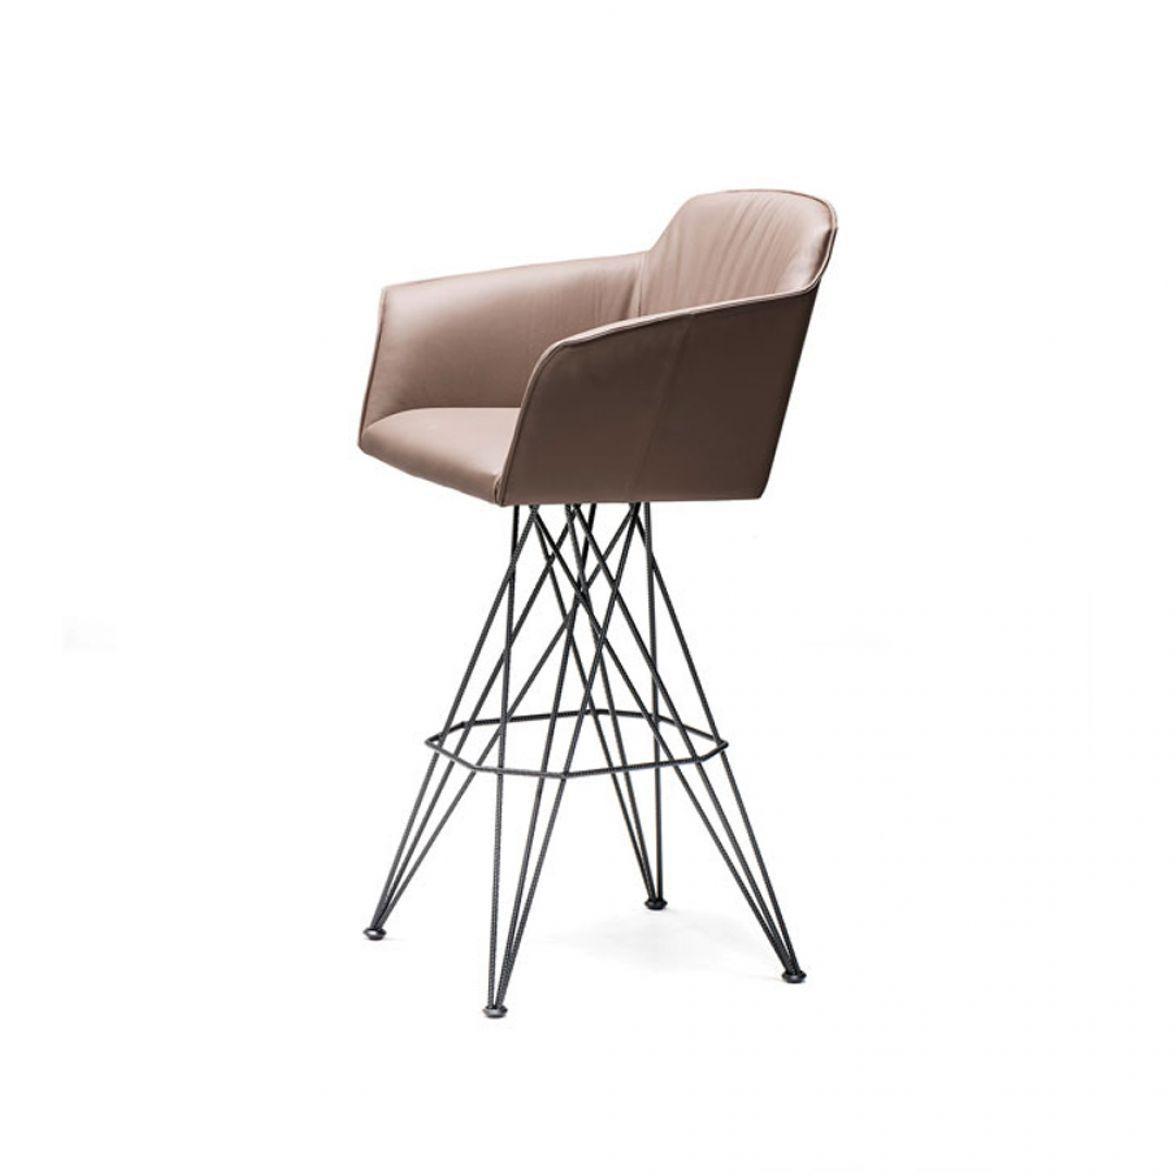 Flaminio chair фото цена